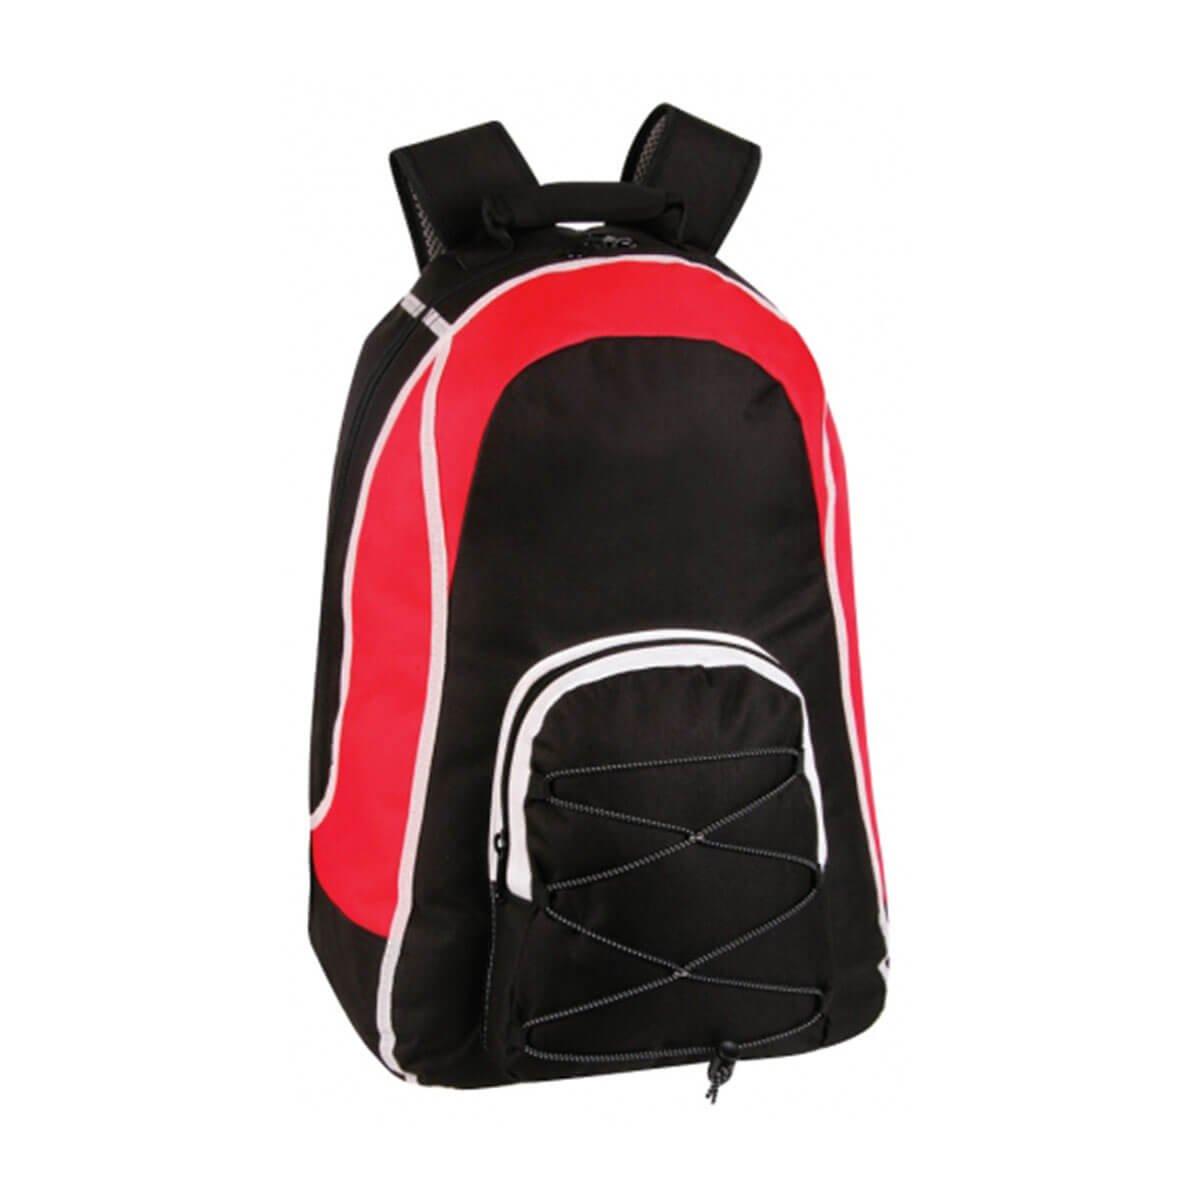 Virage Backpack-Black / White / Red